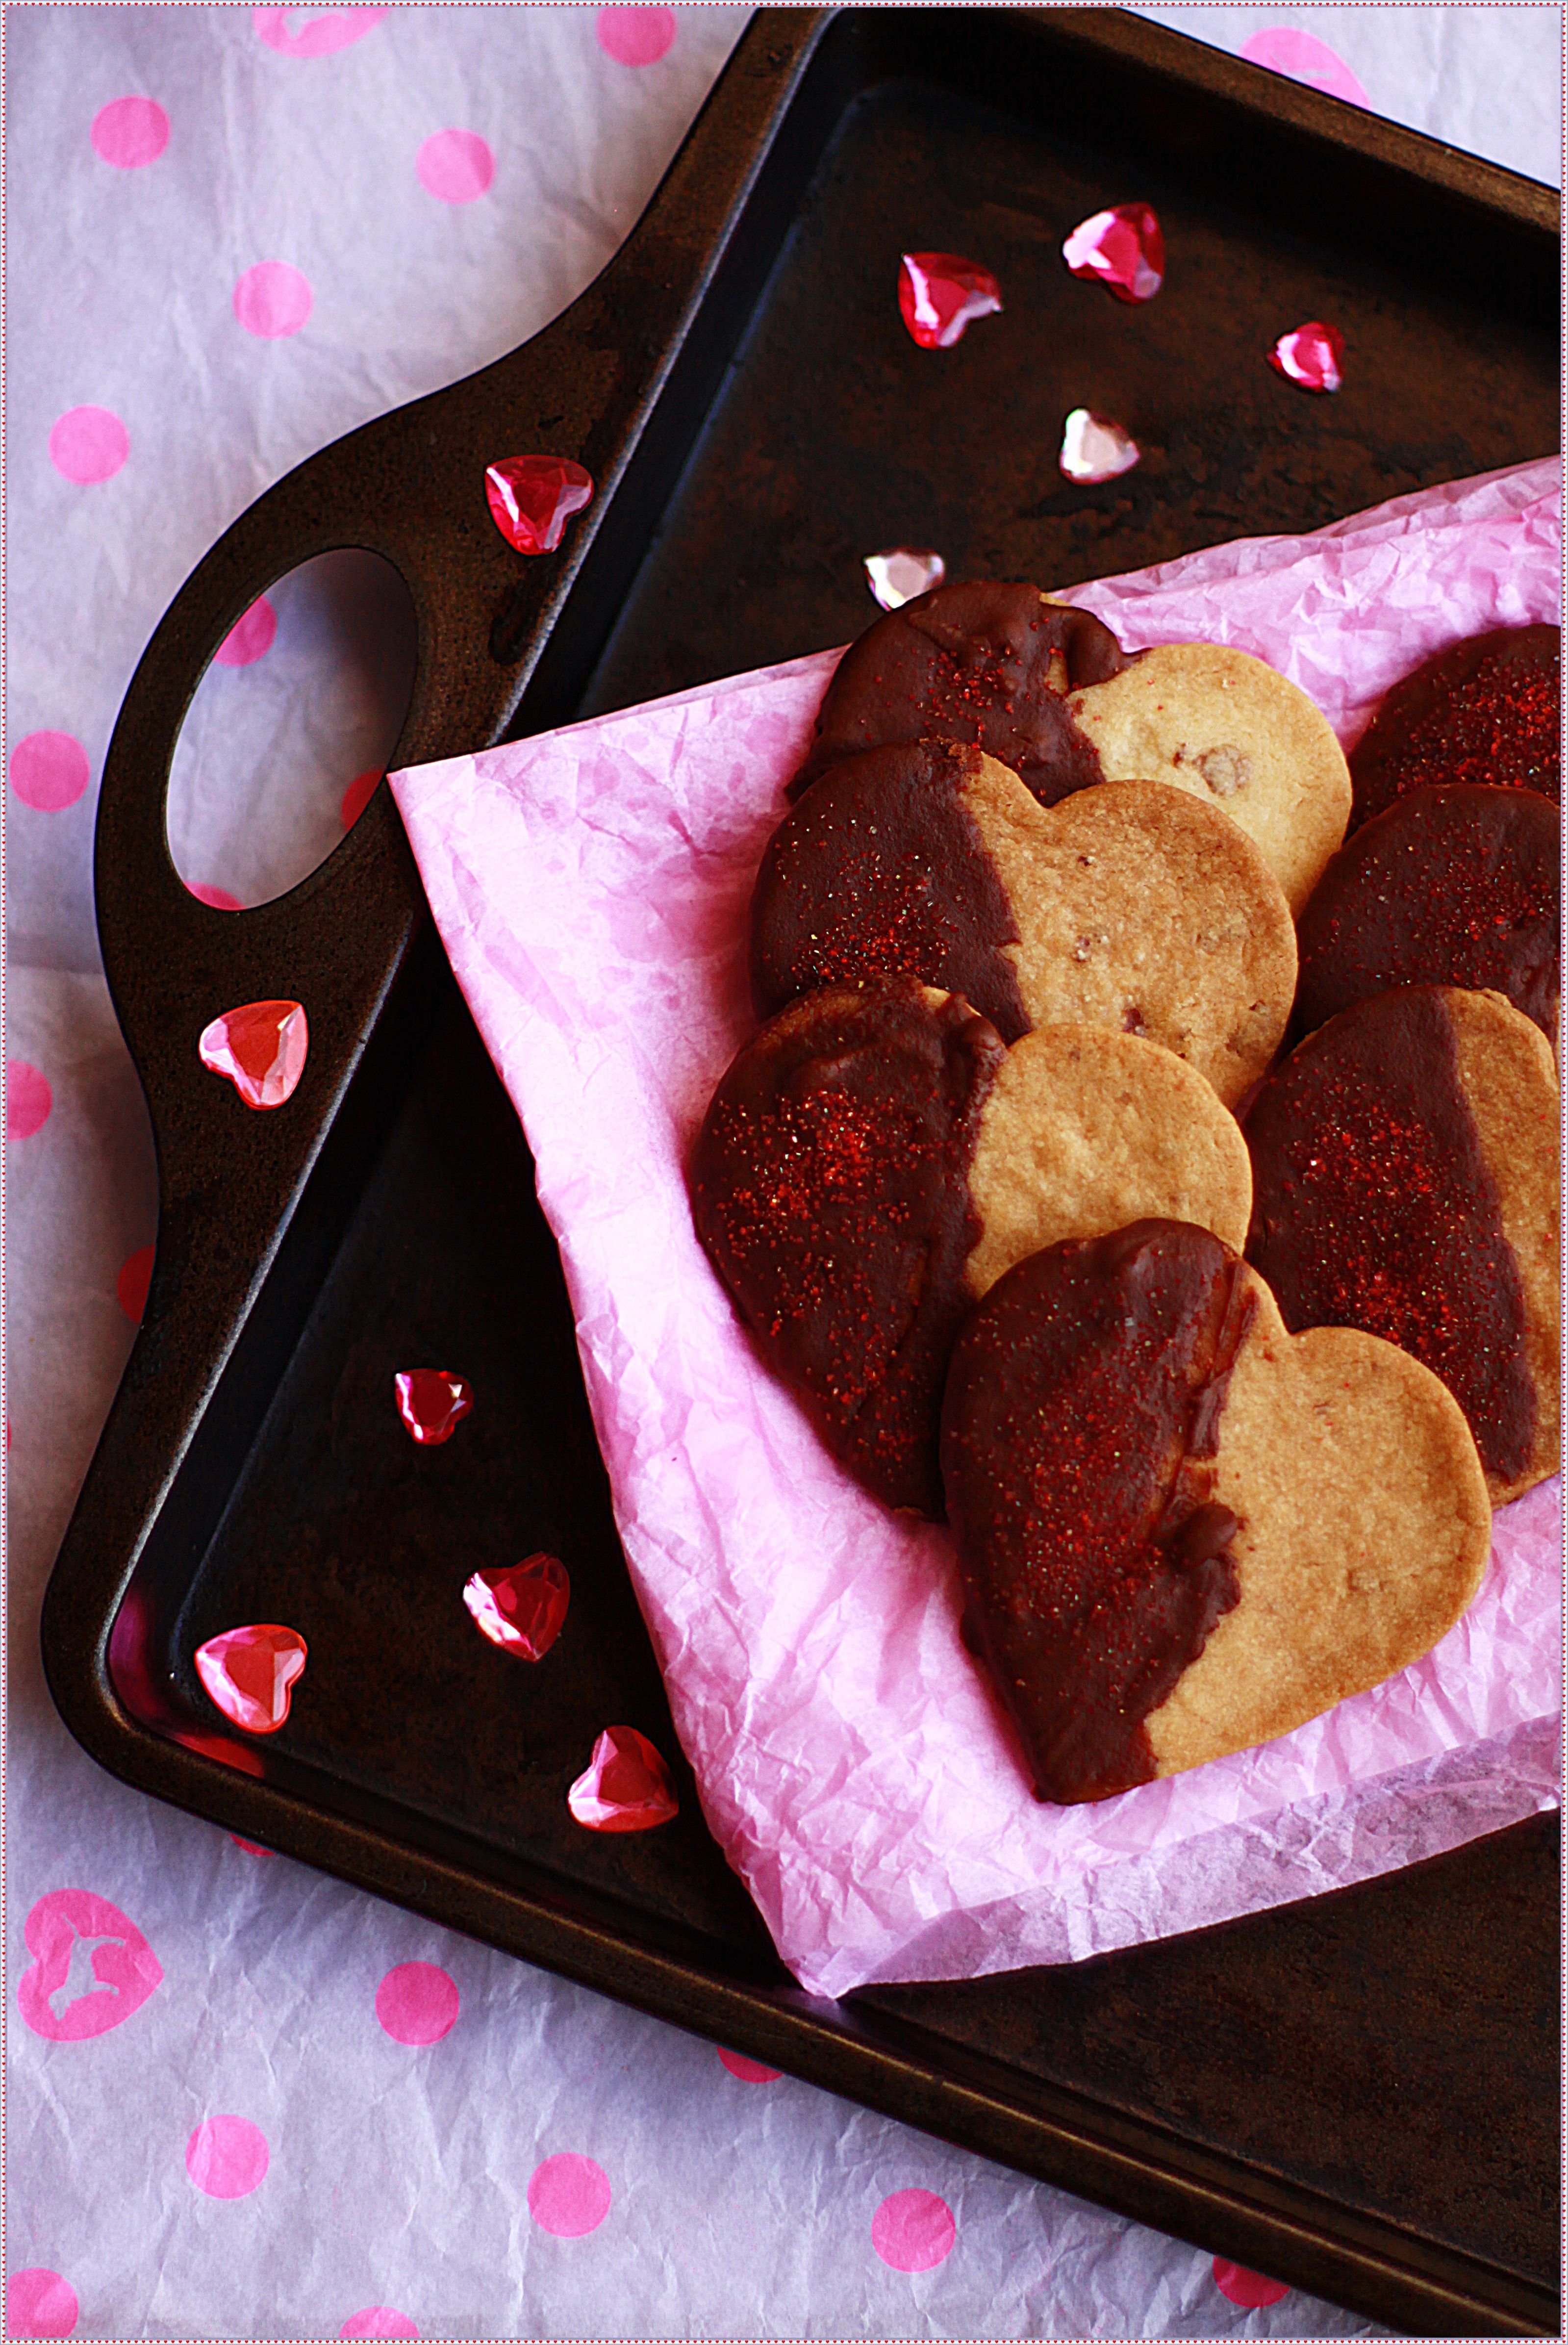 Eggless Chocolate Better Half Cookies!!! http://anubhavati.wordpress.com/2014/02/13/eggless-princess-cookies-with-rose-bits-and-jam-hearts/